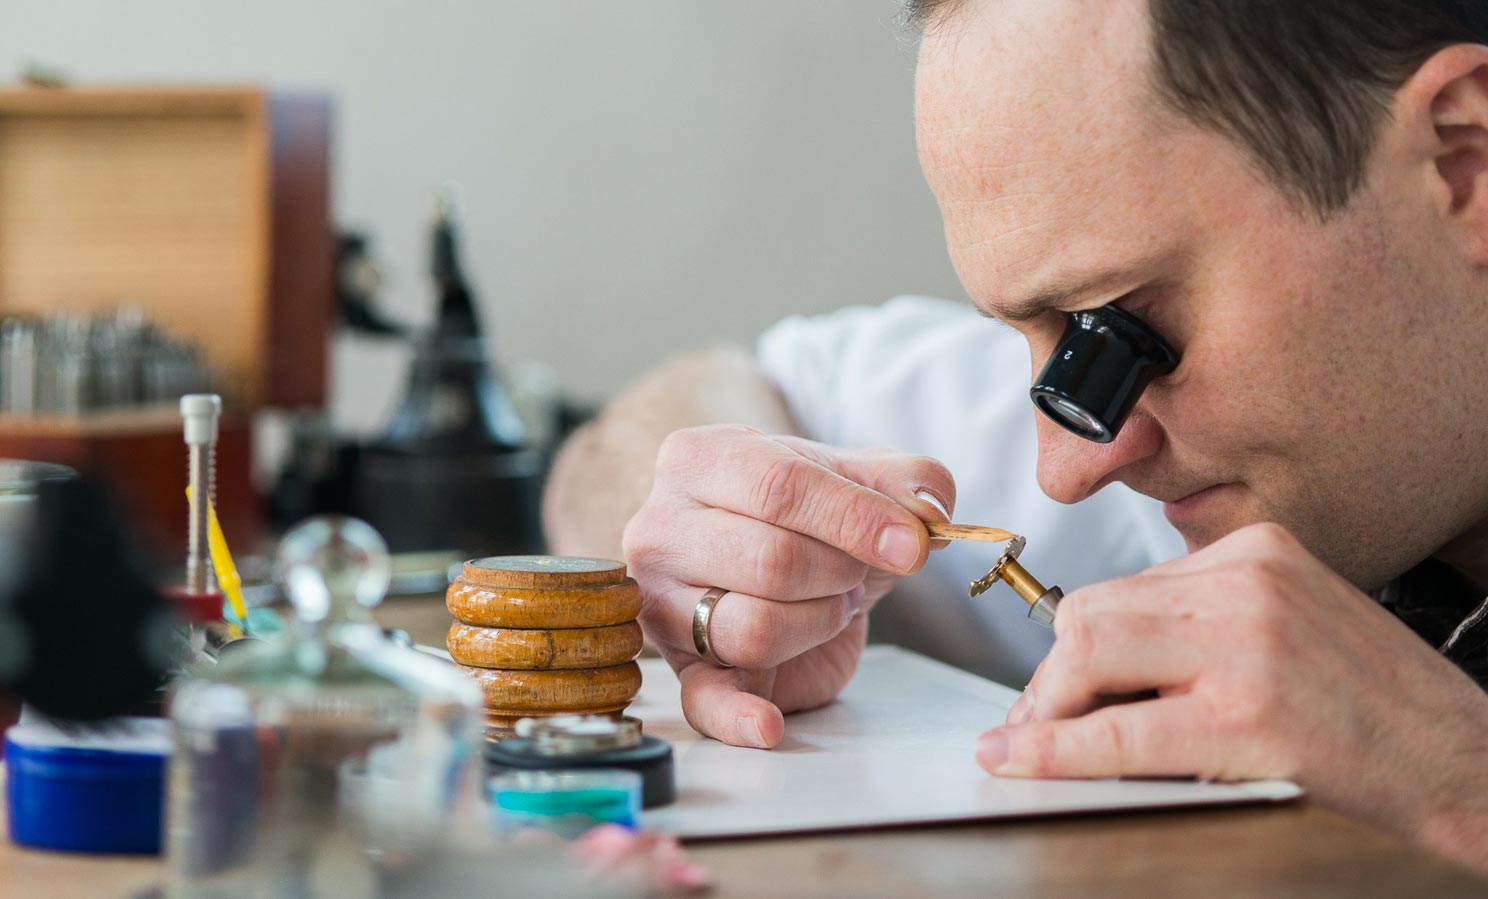 Daniel Malchert beveling the edges of a three-quarter plate